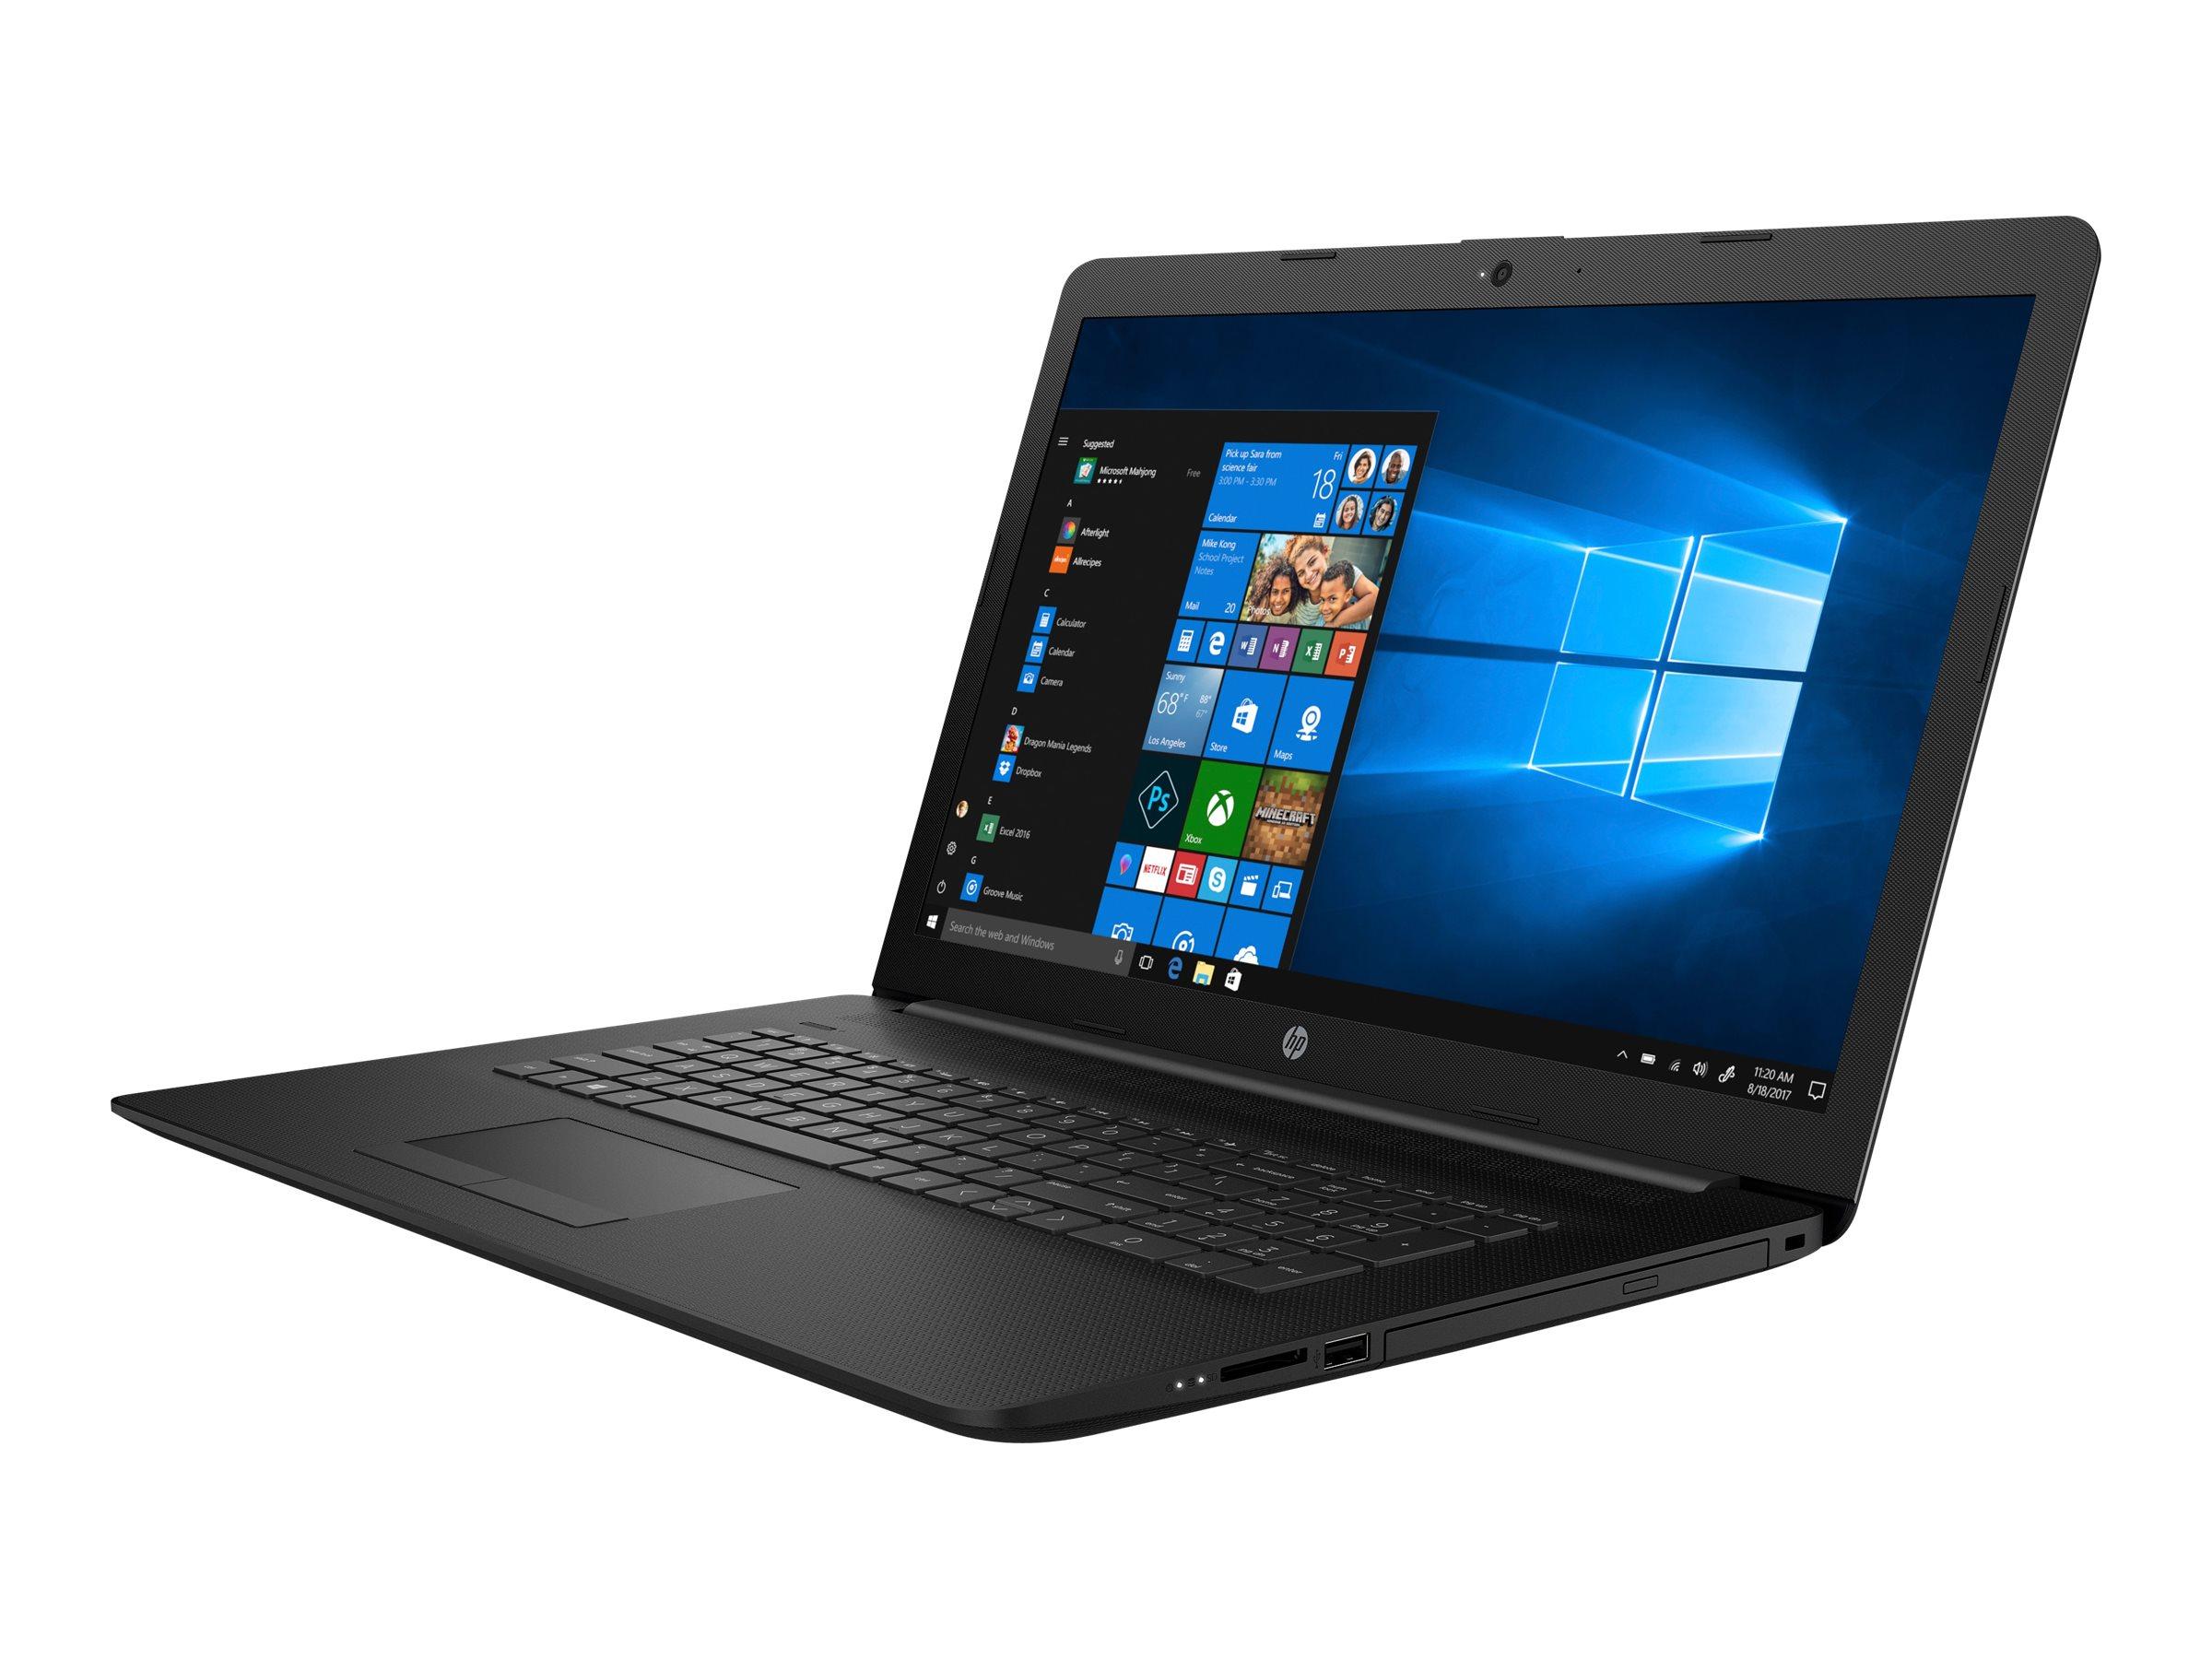 "HP 17-ca0405ng - A6 9225 / 2.6 GHz - Win 10 Home 64-Bit - 4 GB RAM - 1 TB HDD - DVD-Writer - 43.9 cm (17.3"")"